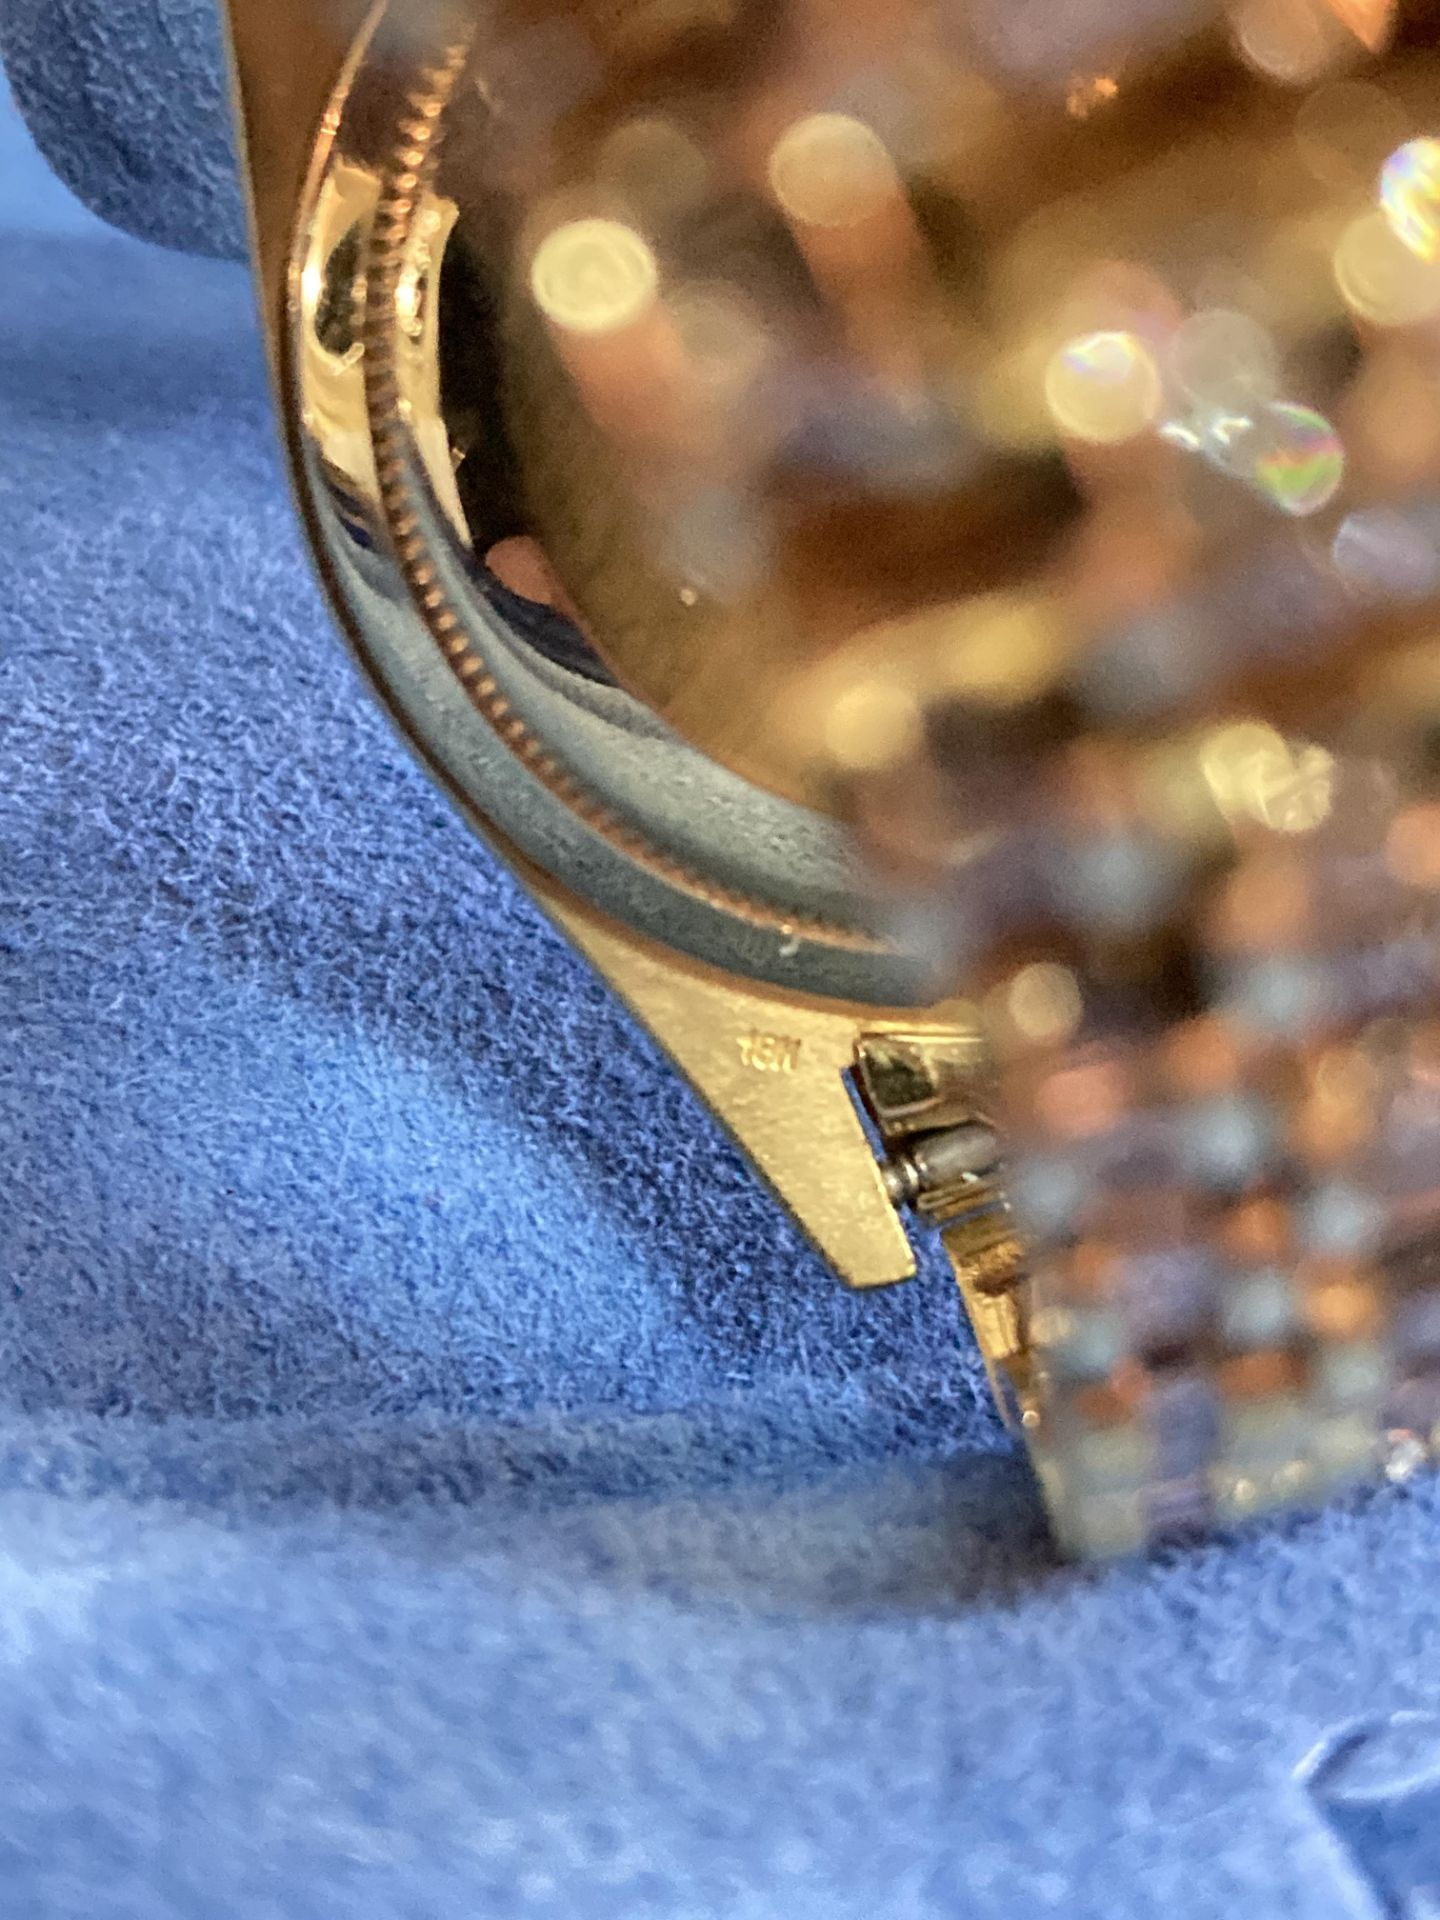 GENTS 36mm ROLEX DAYDATE YELLOW GOLD DIAMOND WATCH - Image 16 of 21